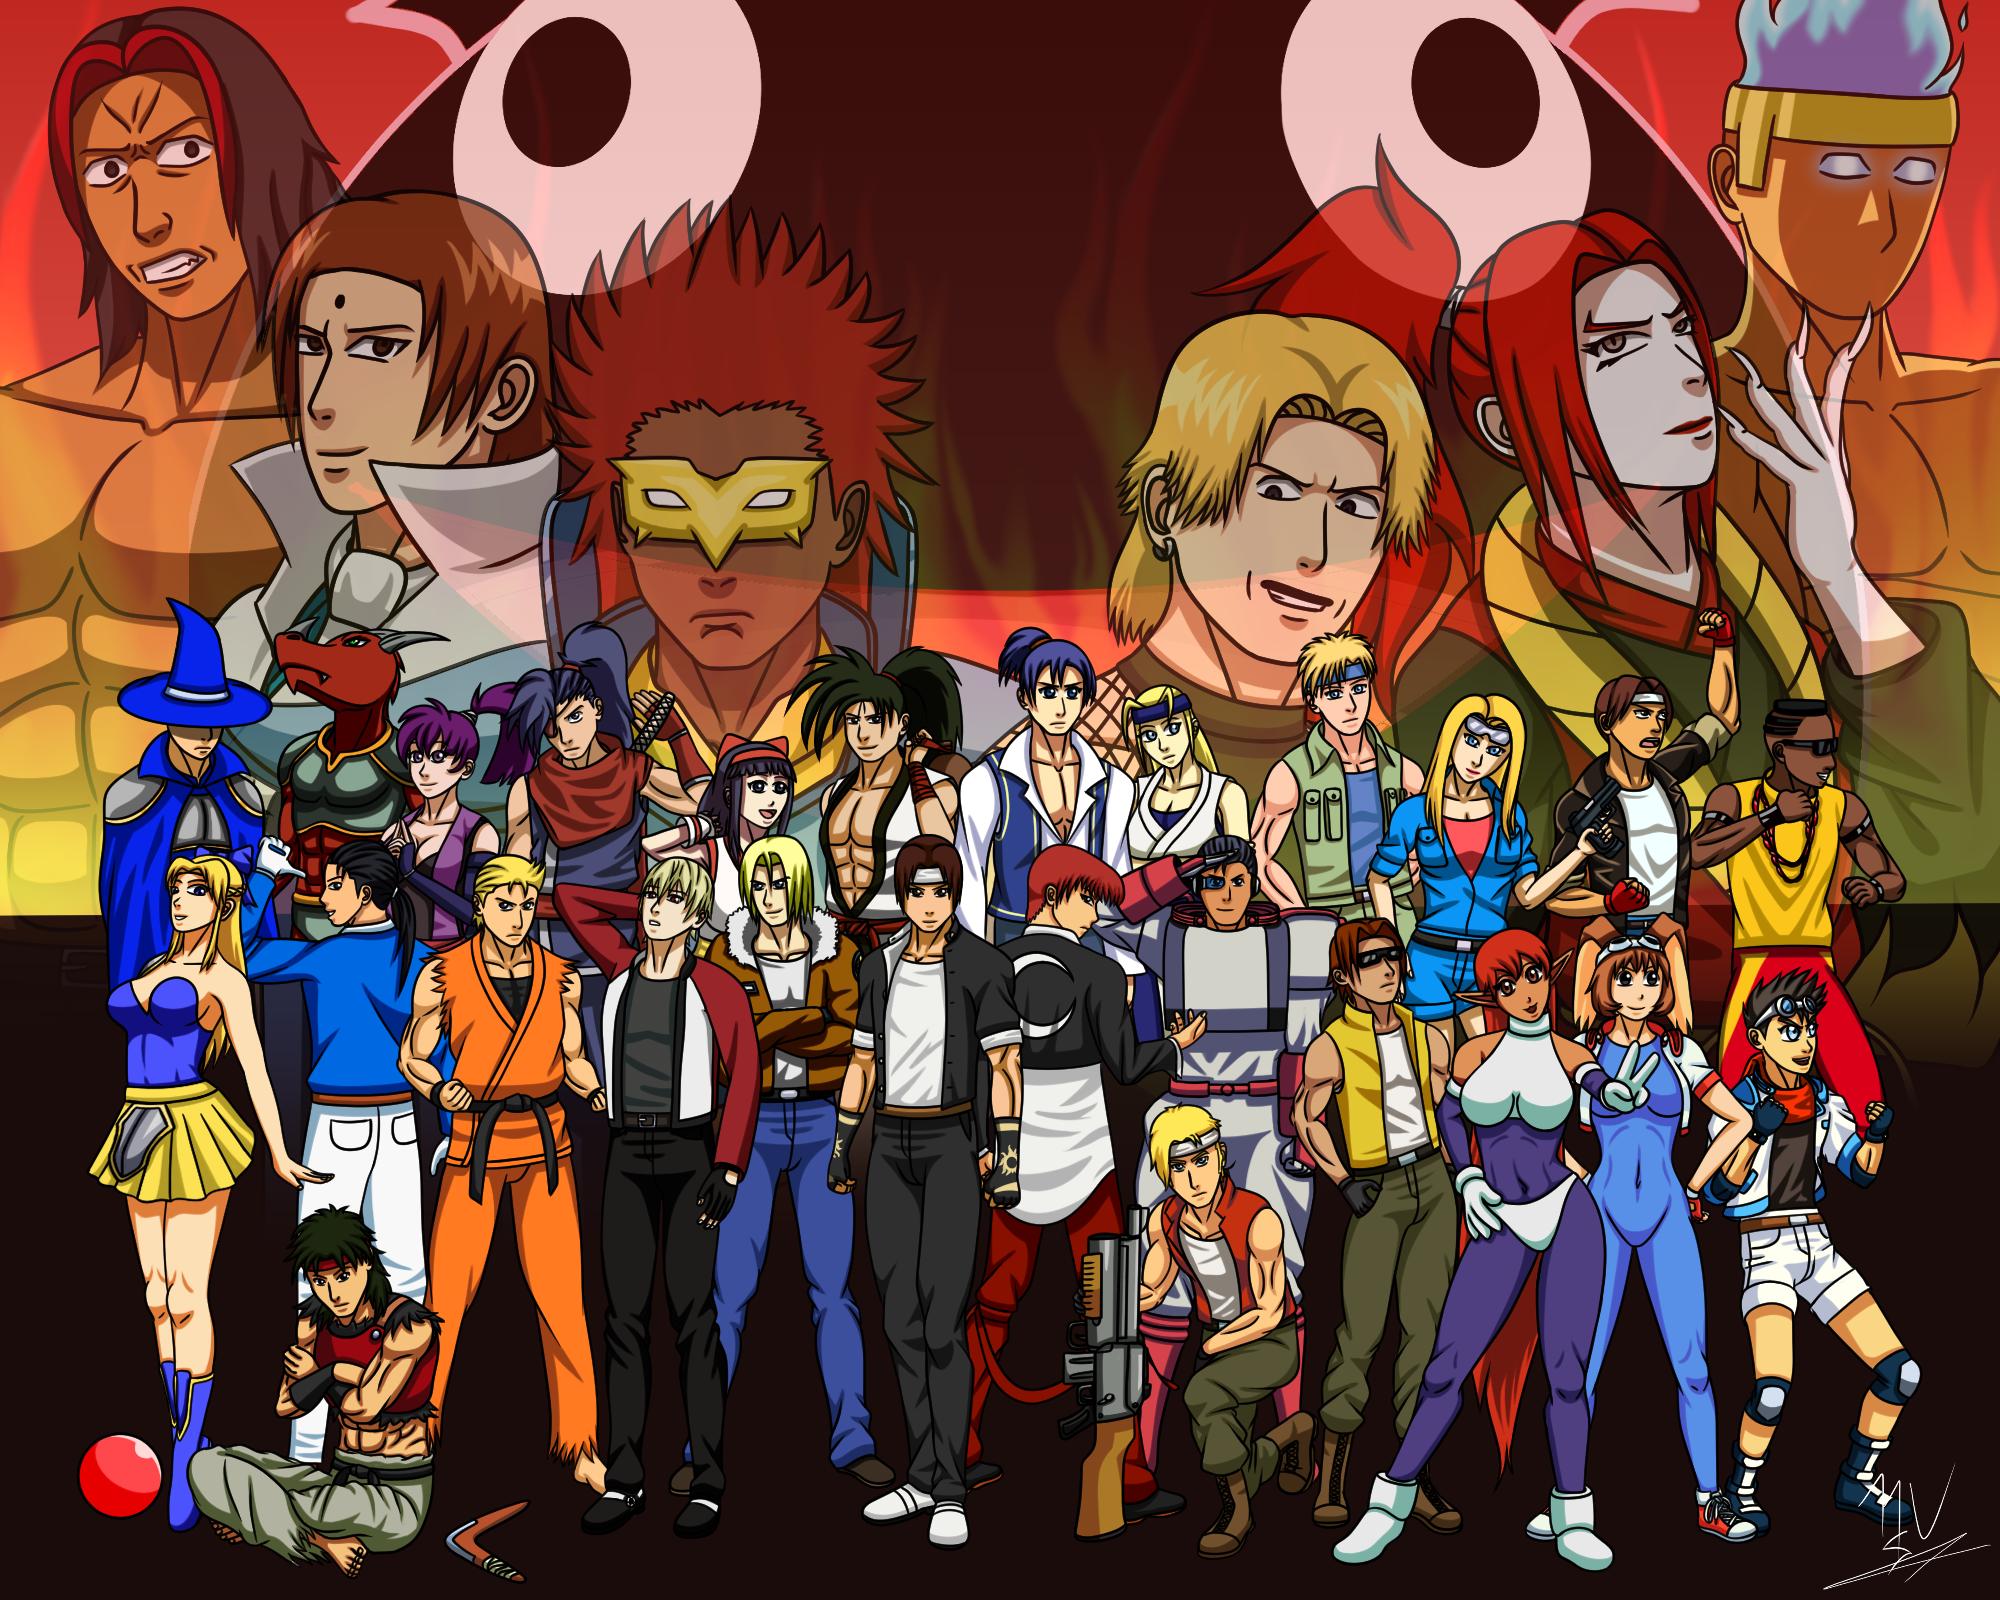 Neo Geo Anime (NeoGeoJam)